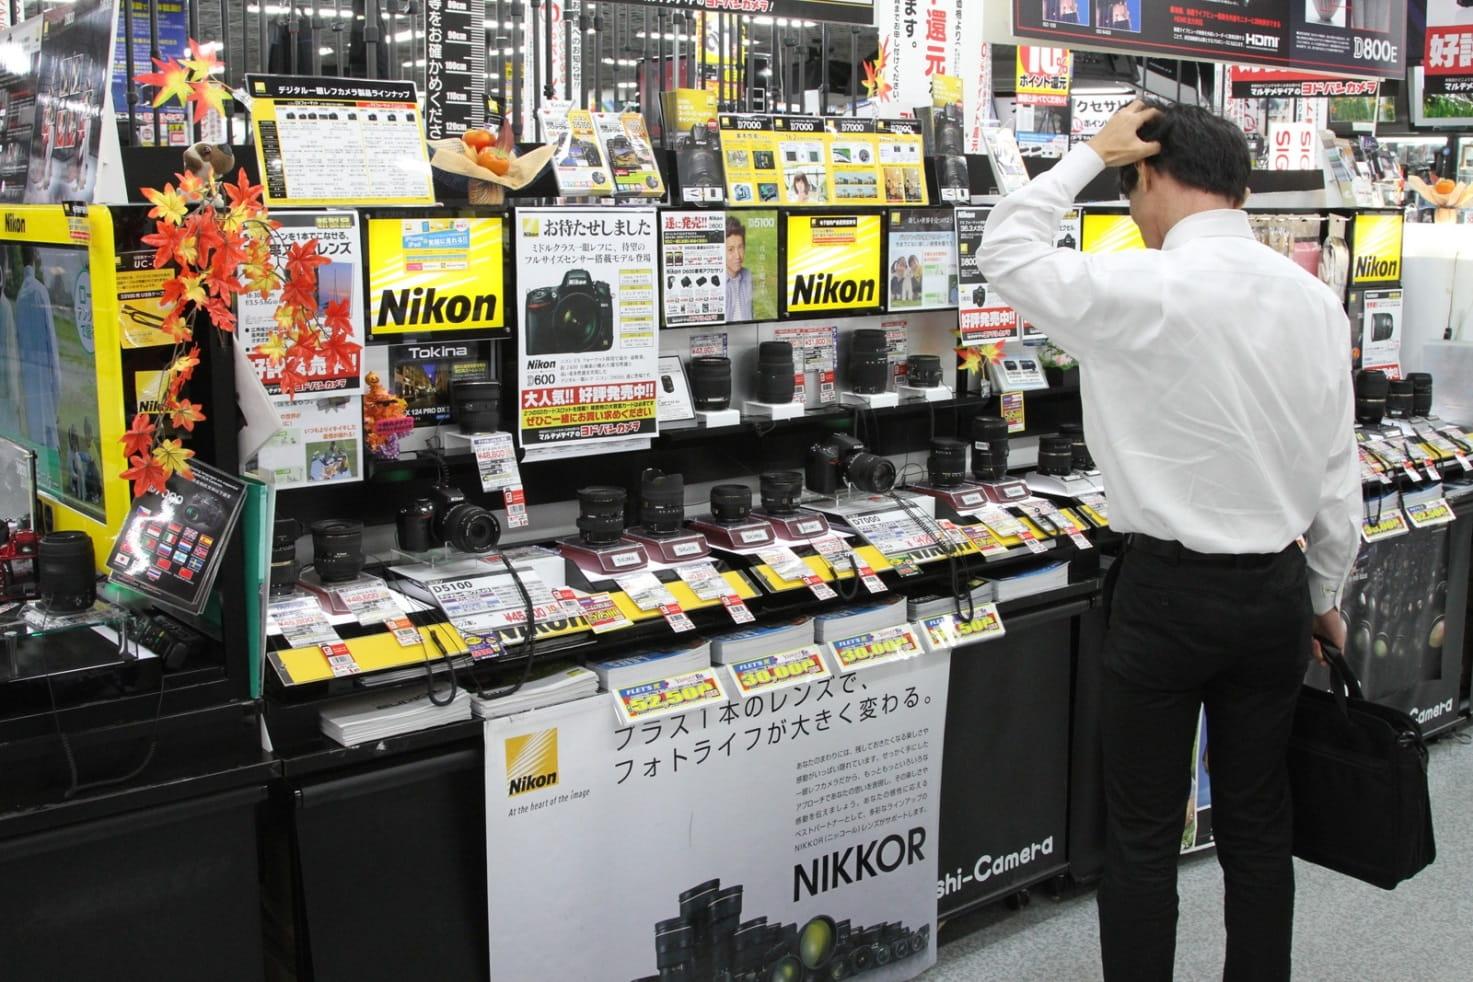 elektronikbutik